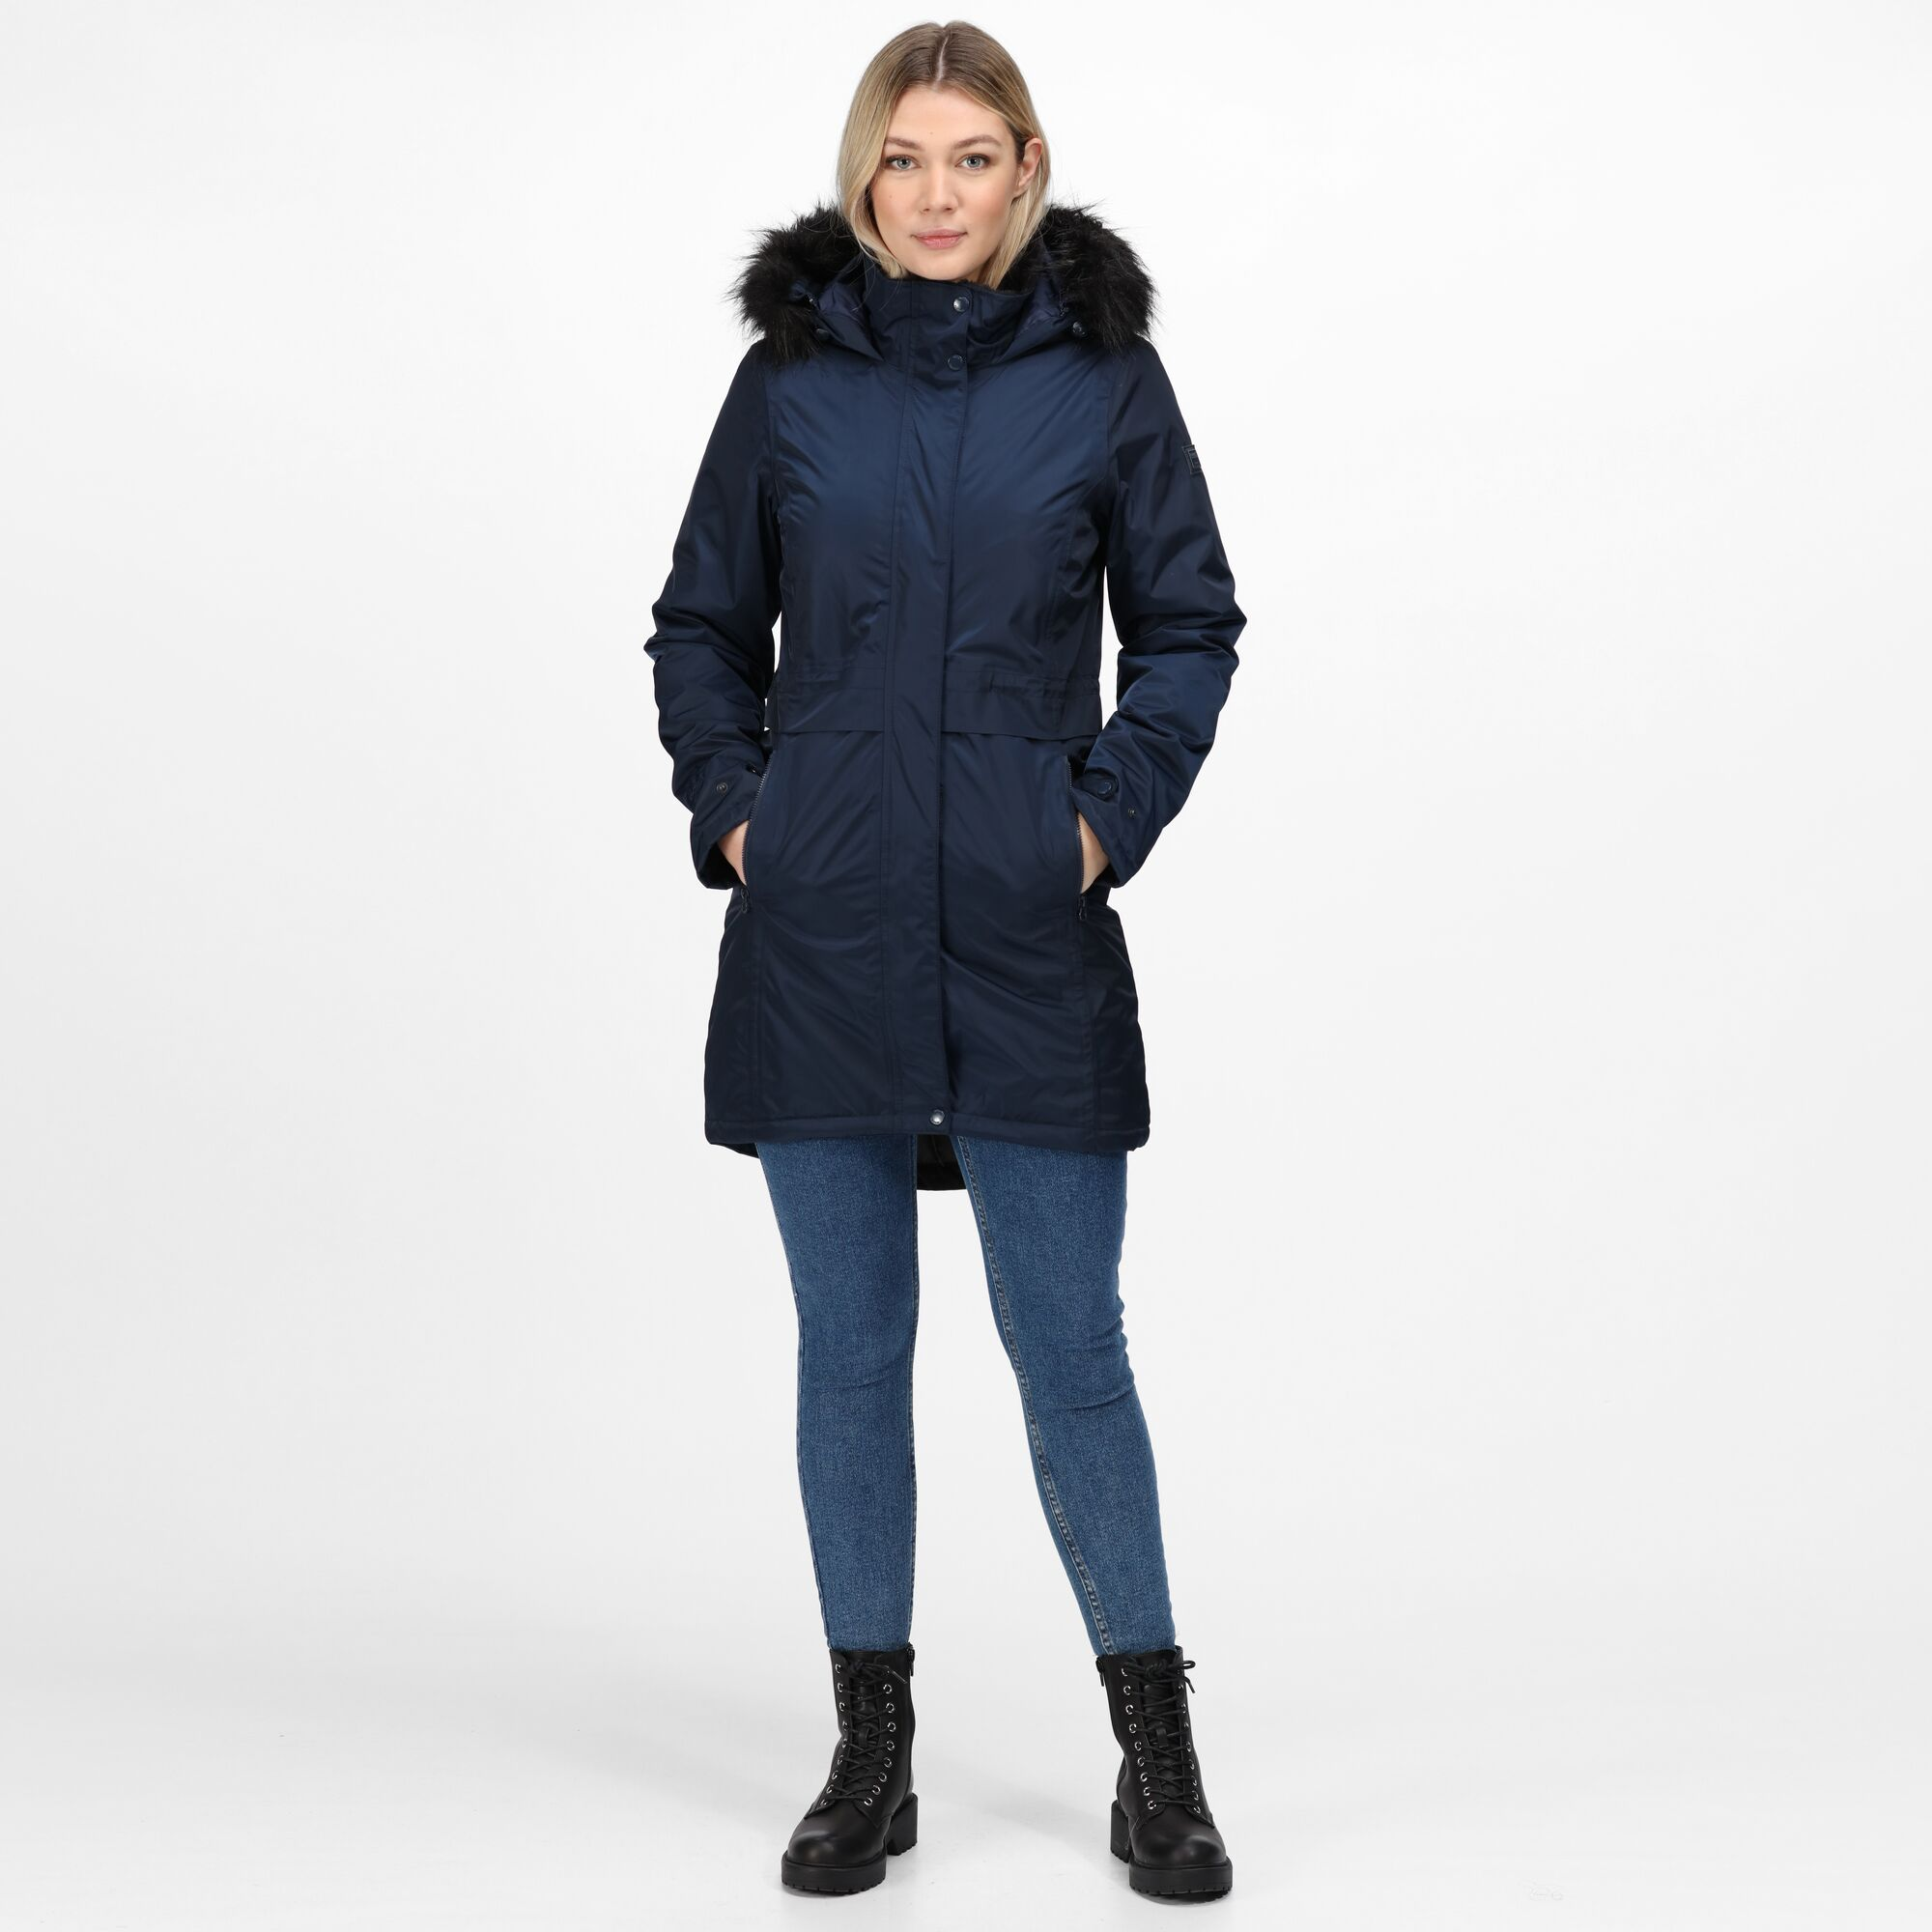 Regatta-Womens-Lexis-Waterproof-Insulated-Fur-Trim-Hood-Parka-Jacket-Blue-Navy thumbnail 9